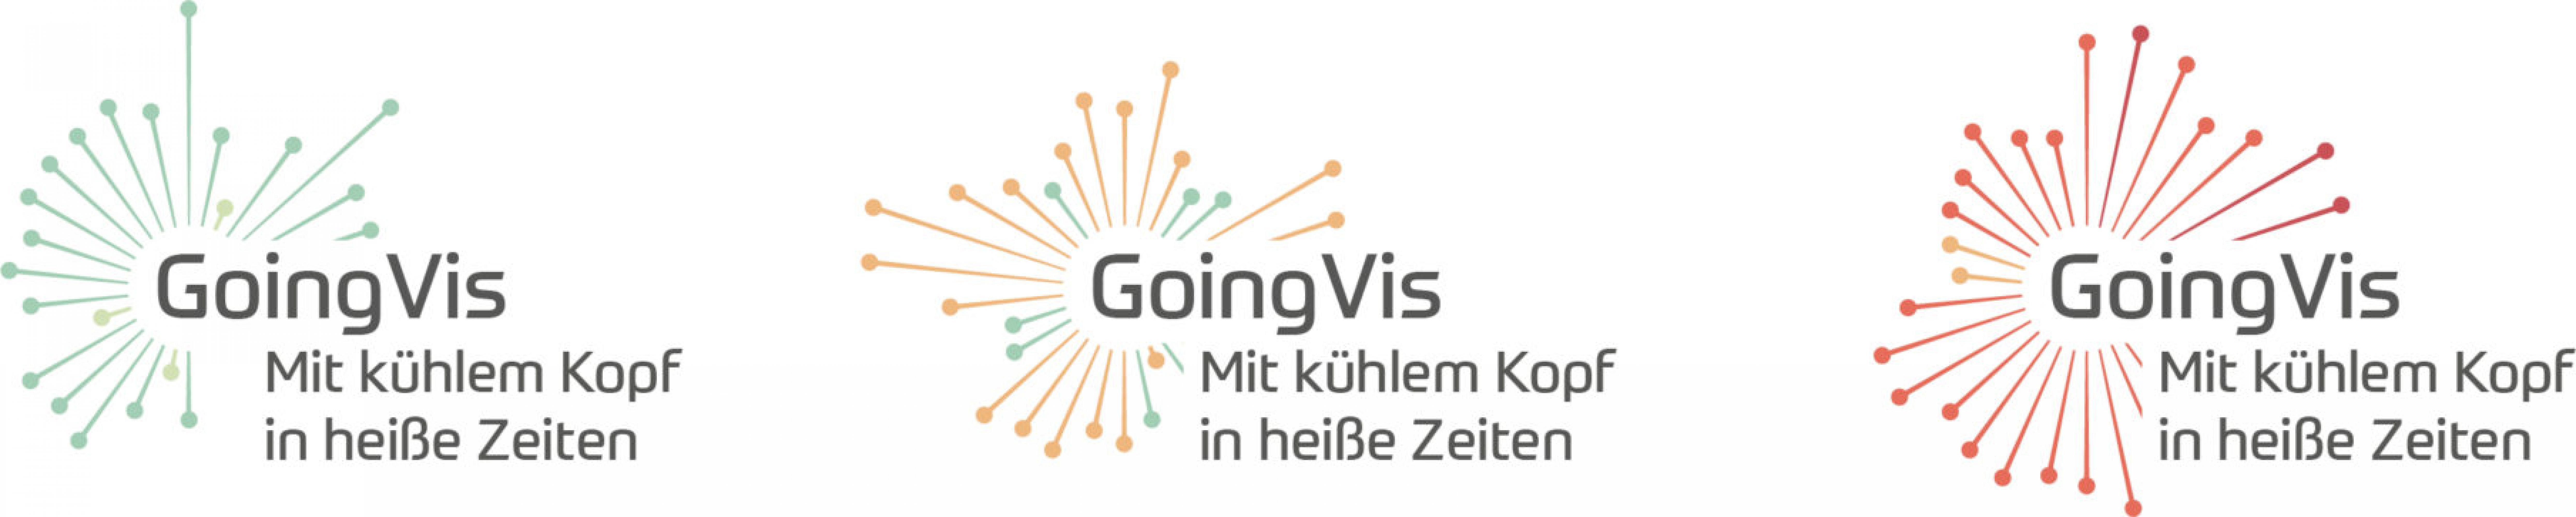 formlos-berlin-goingvis-logo-jahreszeiten-corporate-design-1808x363